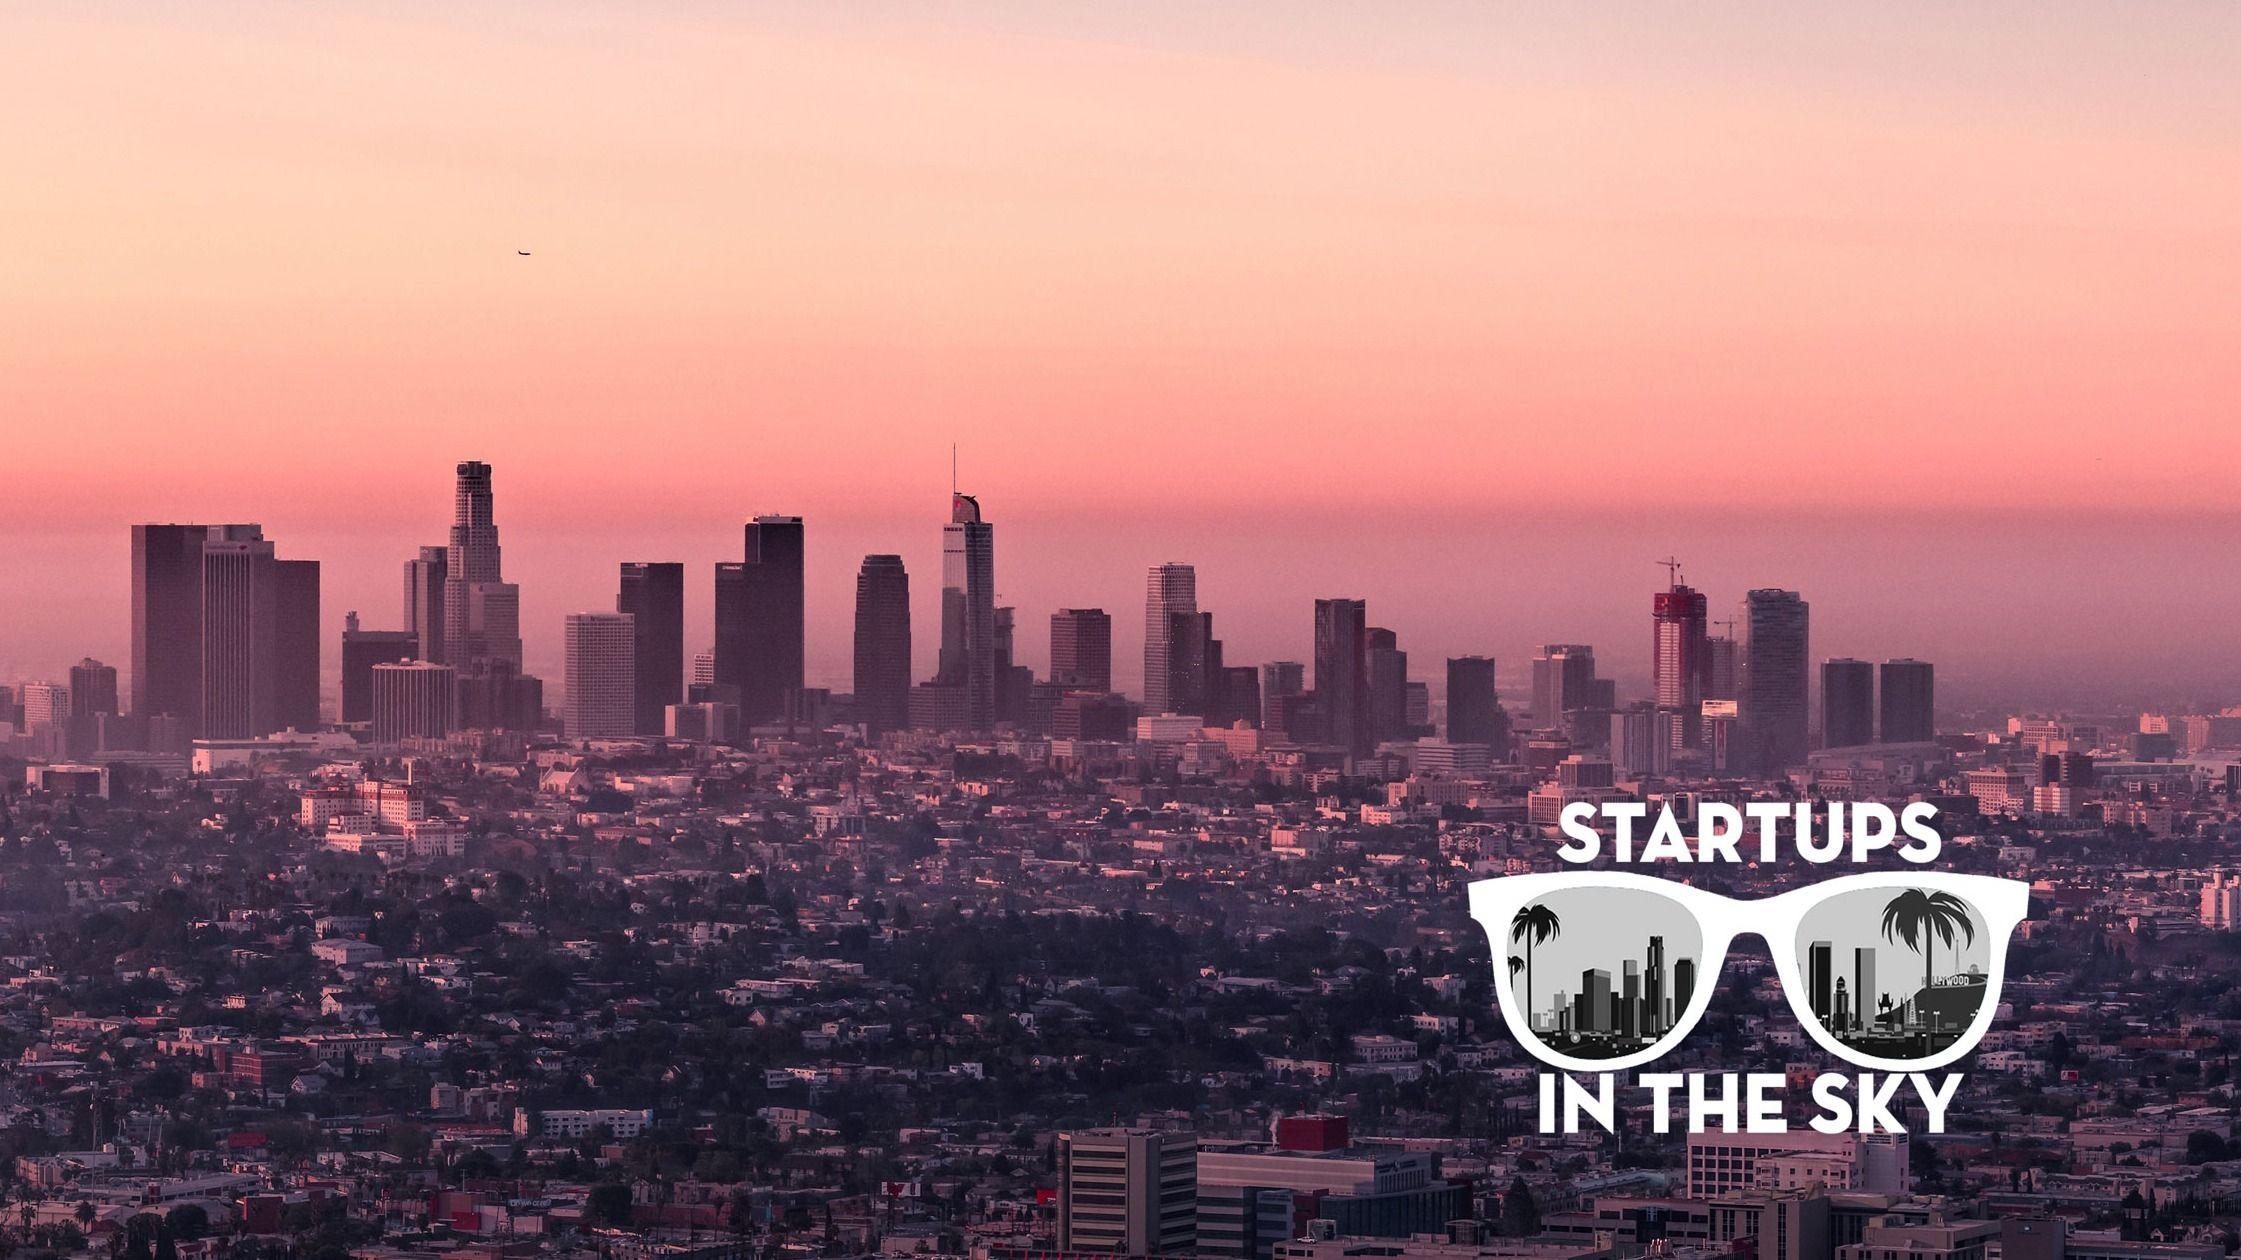 Startups in the Sky